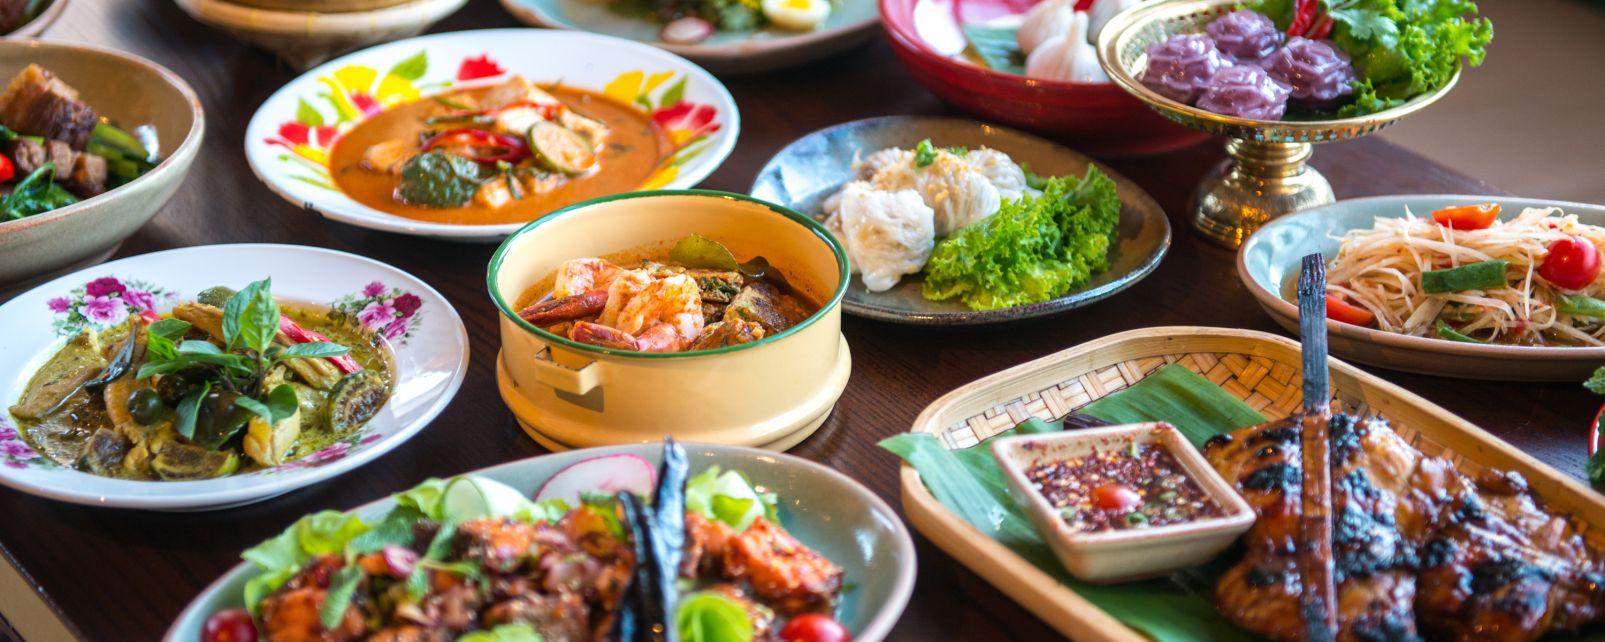 Cocina Thailandesa | La Cocina Tailandesa Tailandia